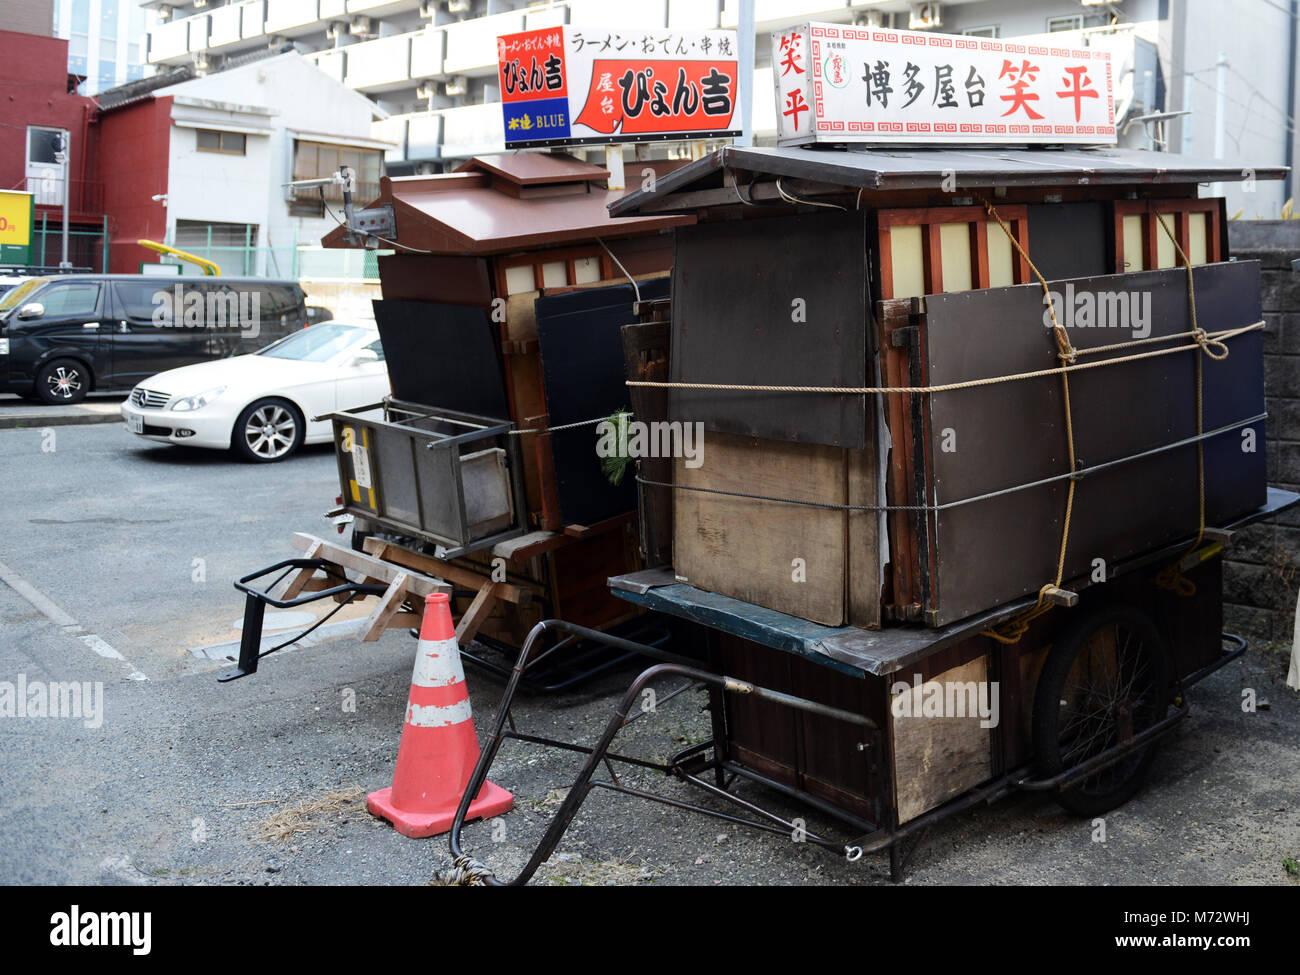 Yatai food carts in Fukuoka, Japan. - Stock Image